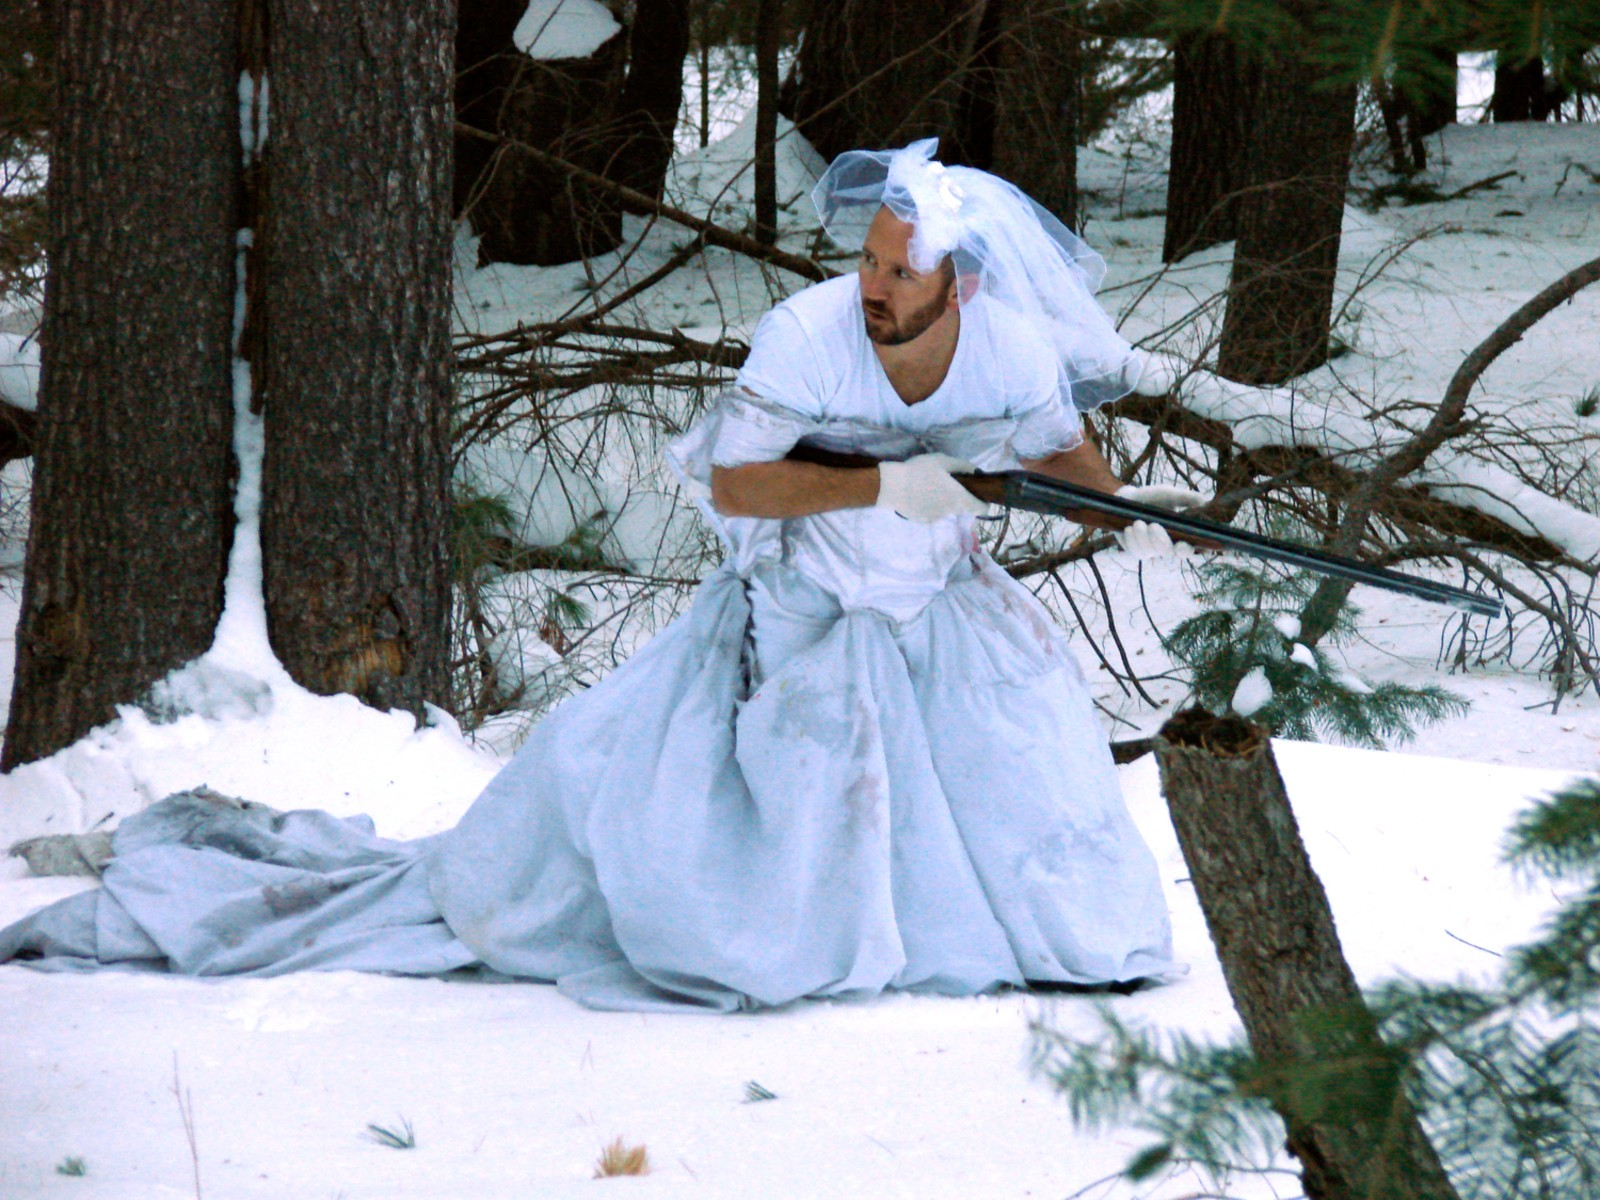 punching bag fishing net new uses exs wedding dress blue camo wedding dresses New uses for an ex s wedding dress